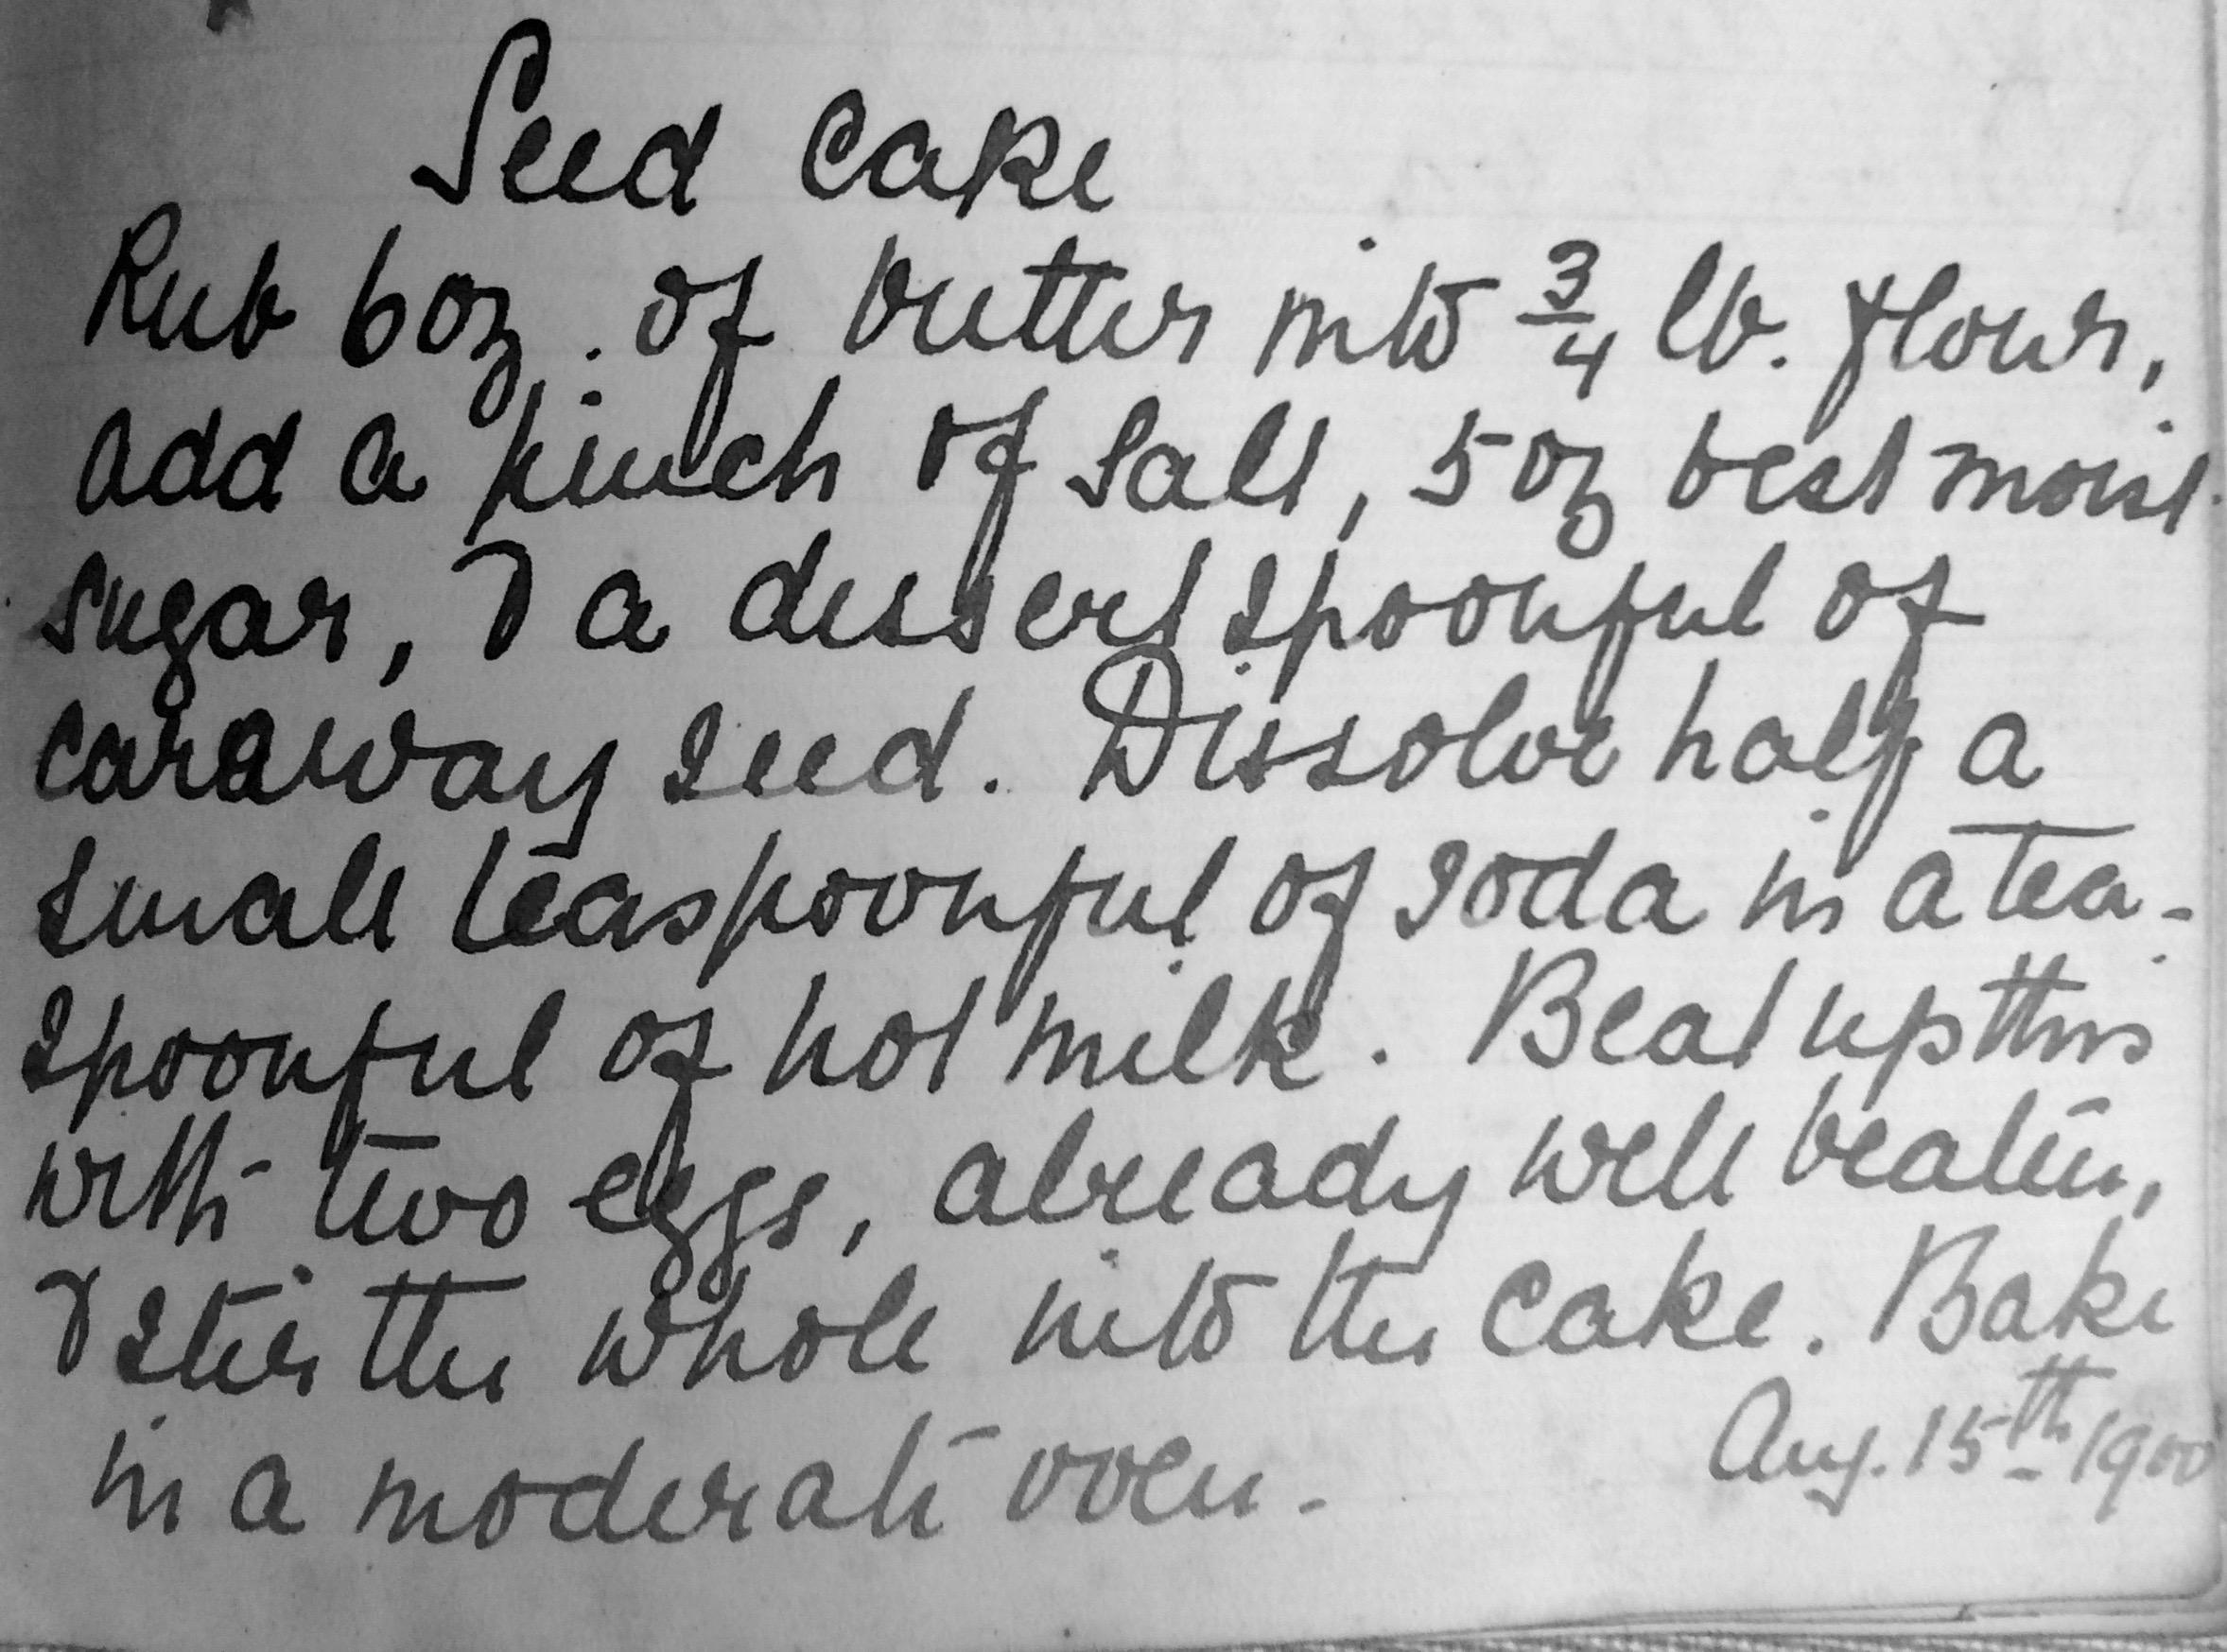 Granny Hall's Seed Cake recipe 1900